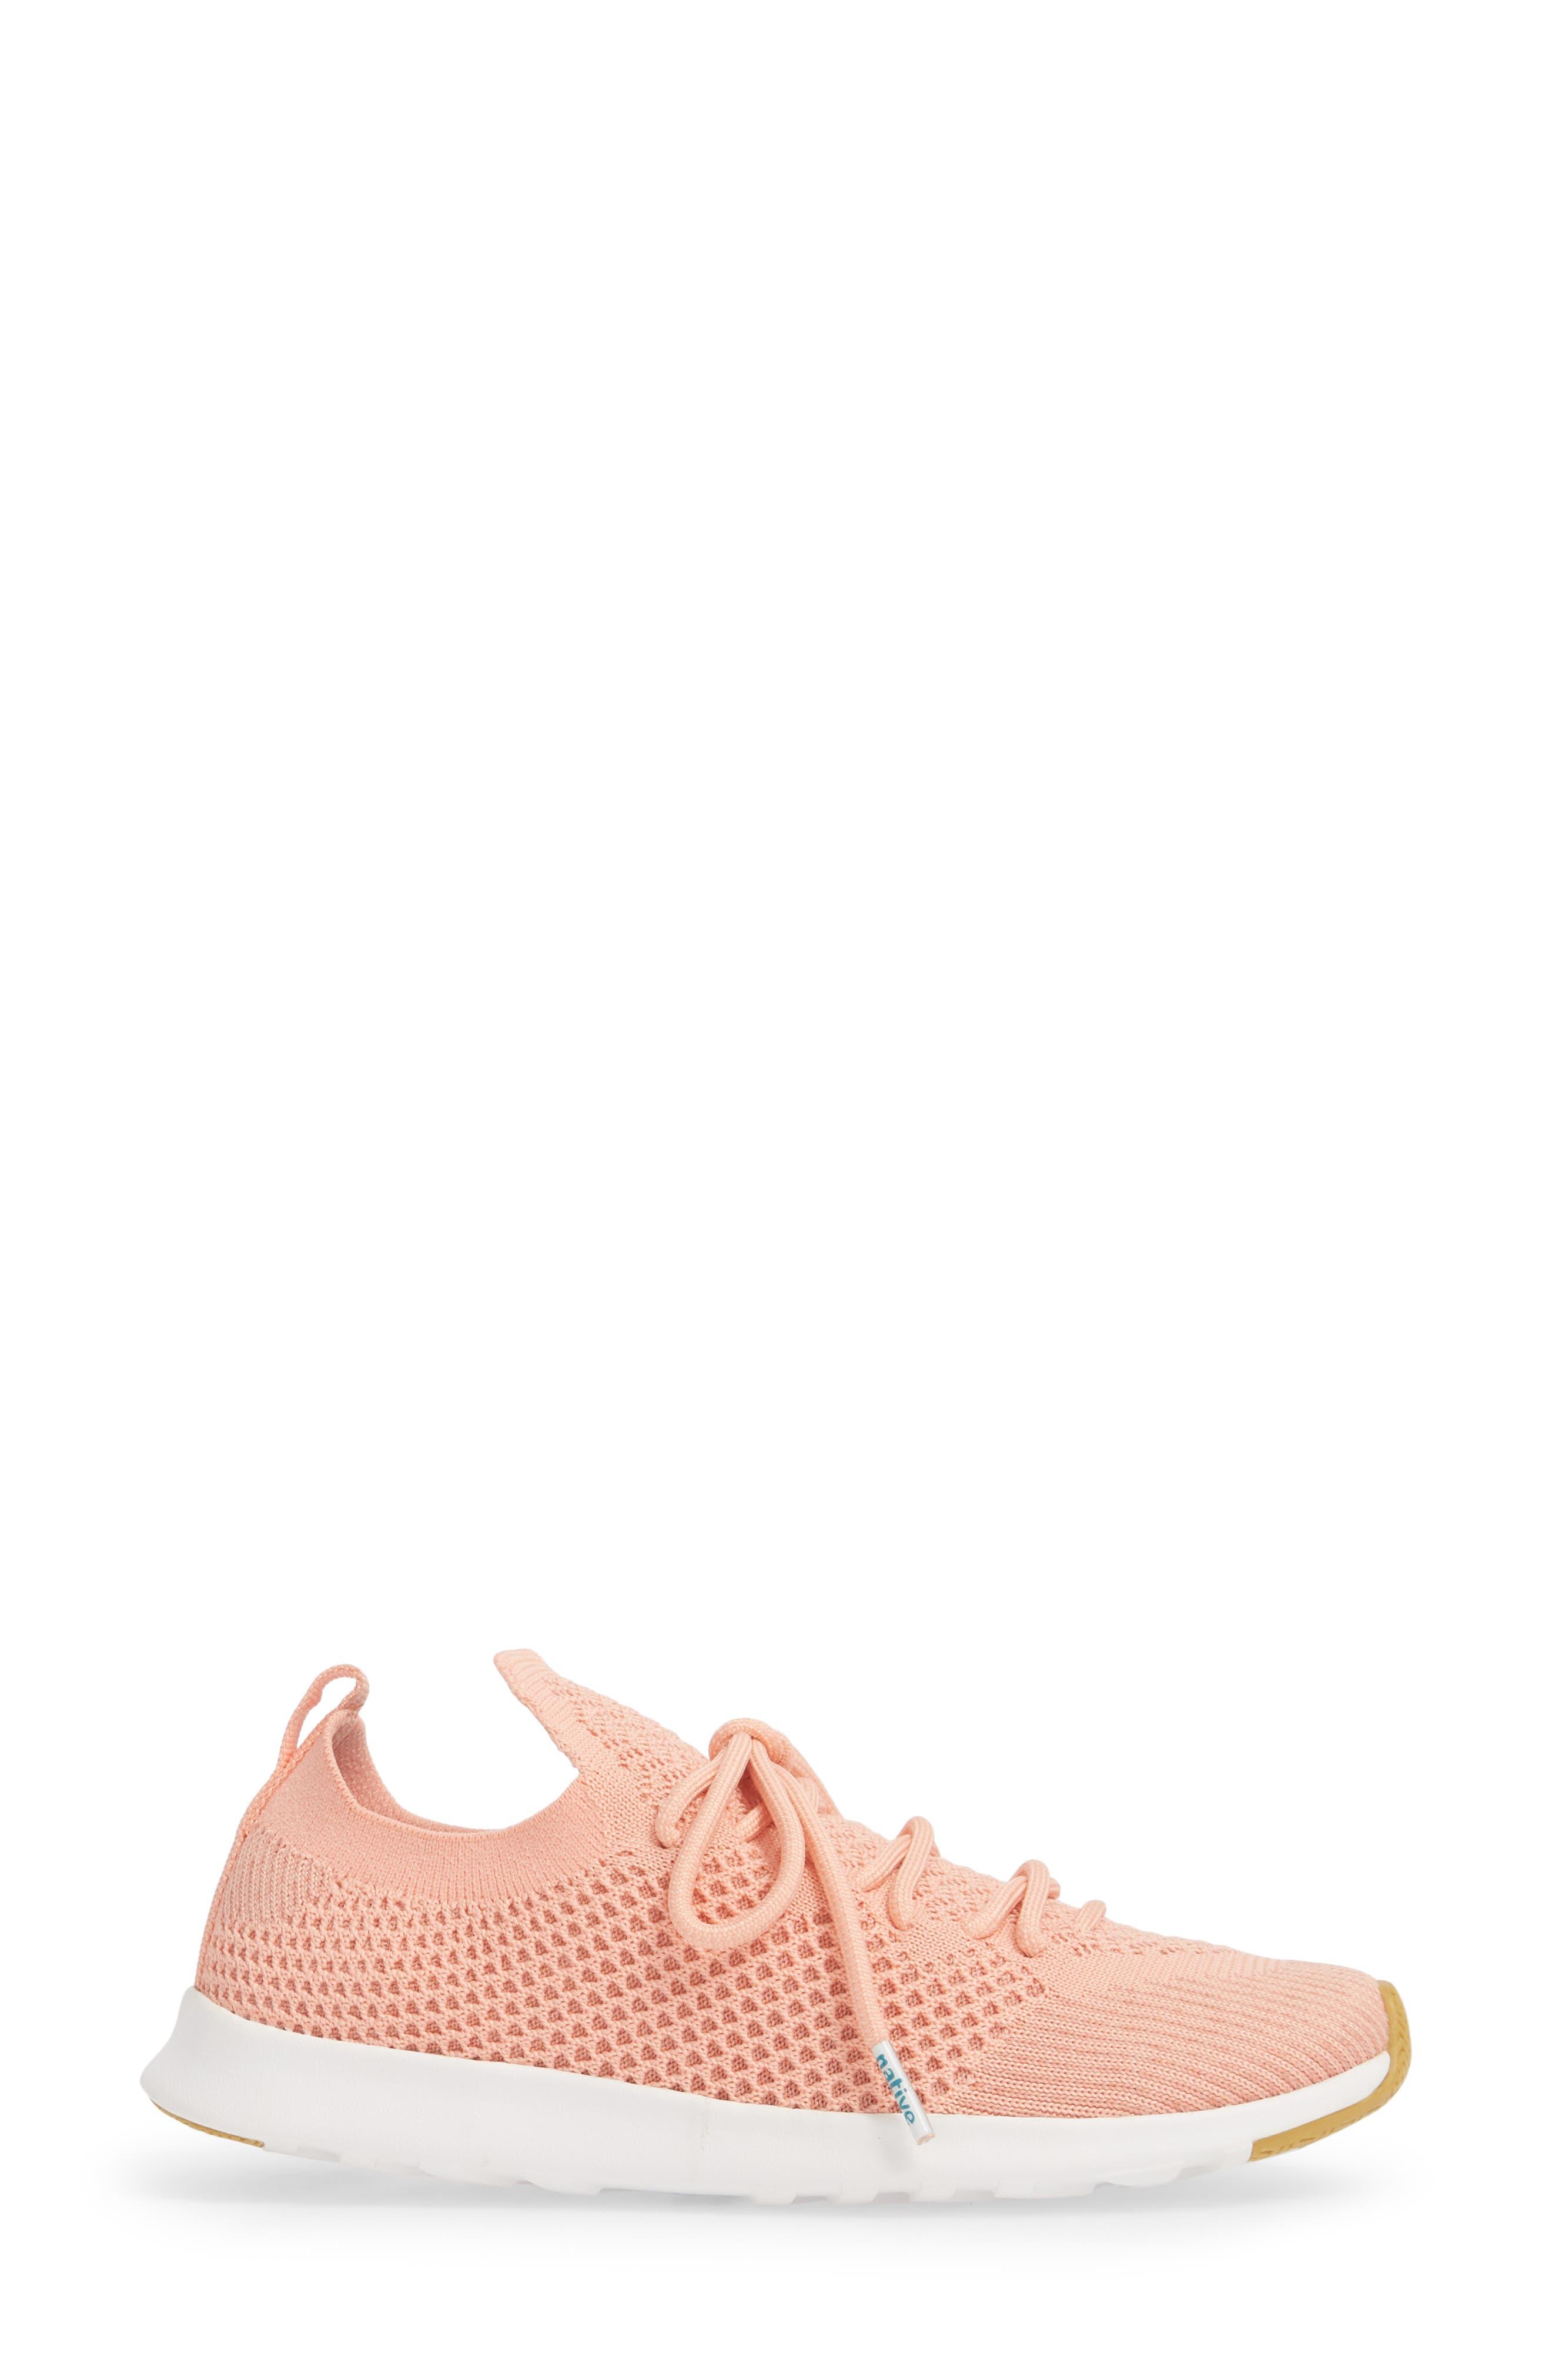 AP Mercury Liteknit Sneaker,                             Alternate thumbnail 3, color,                             Clay Pink/ Shell White